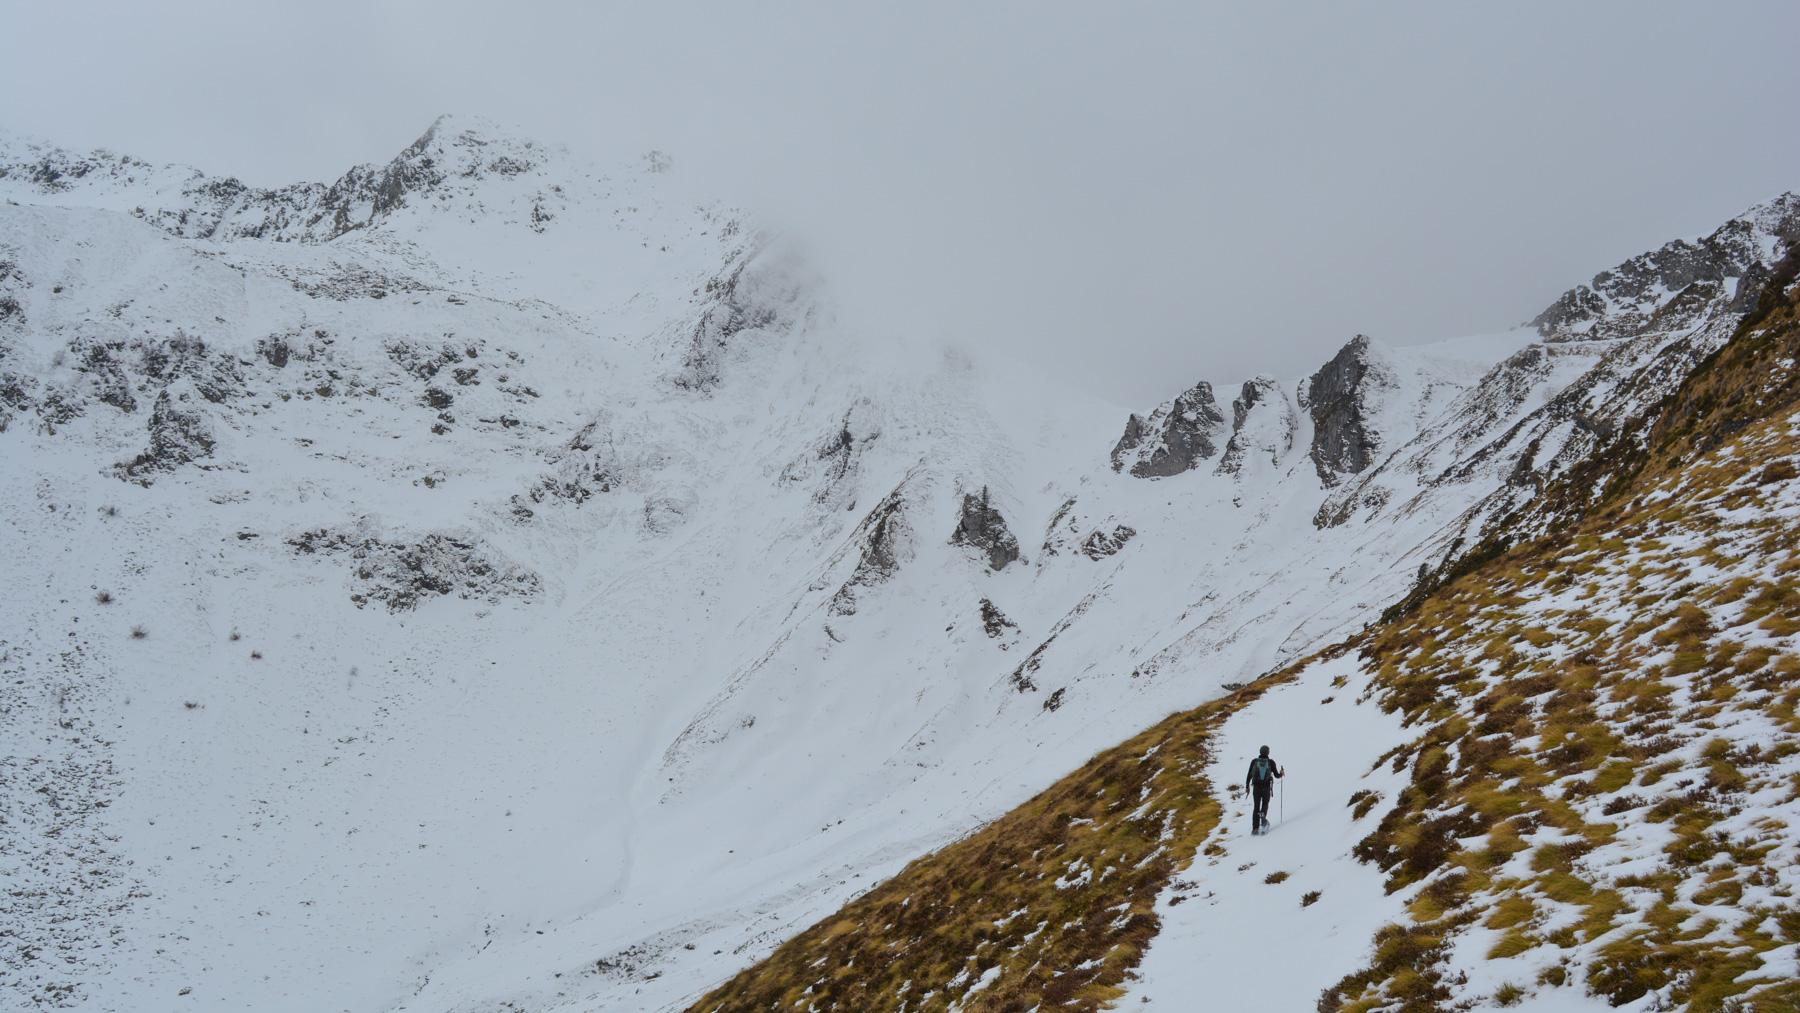 Ariège sous la neige, enfin ! 11